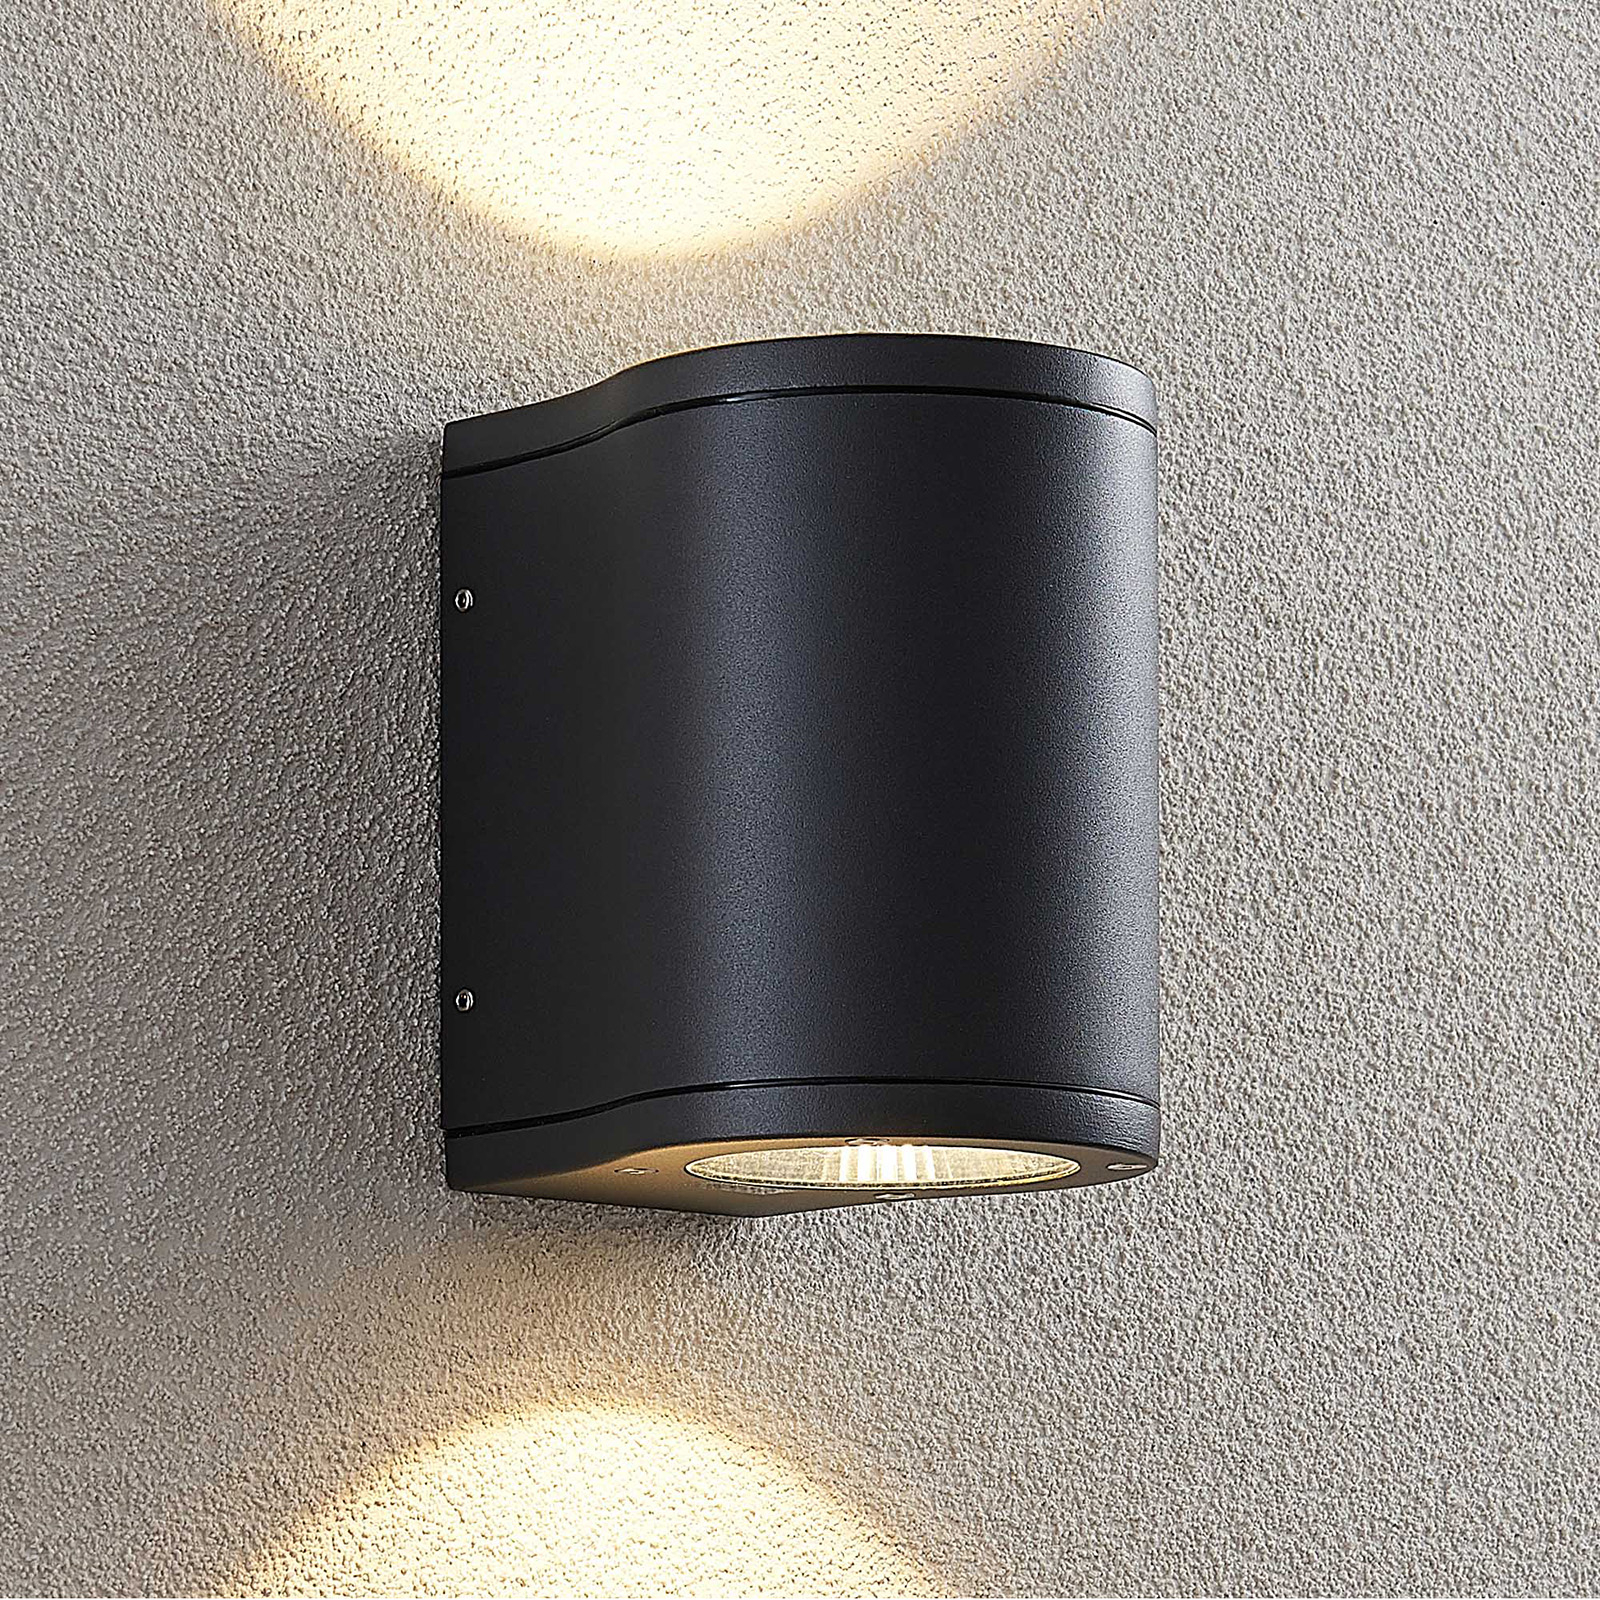 Lucande Janelis LED outdoor wall light, dark grey_9969174_1